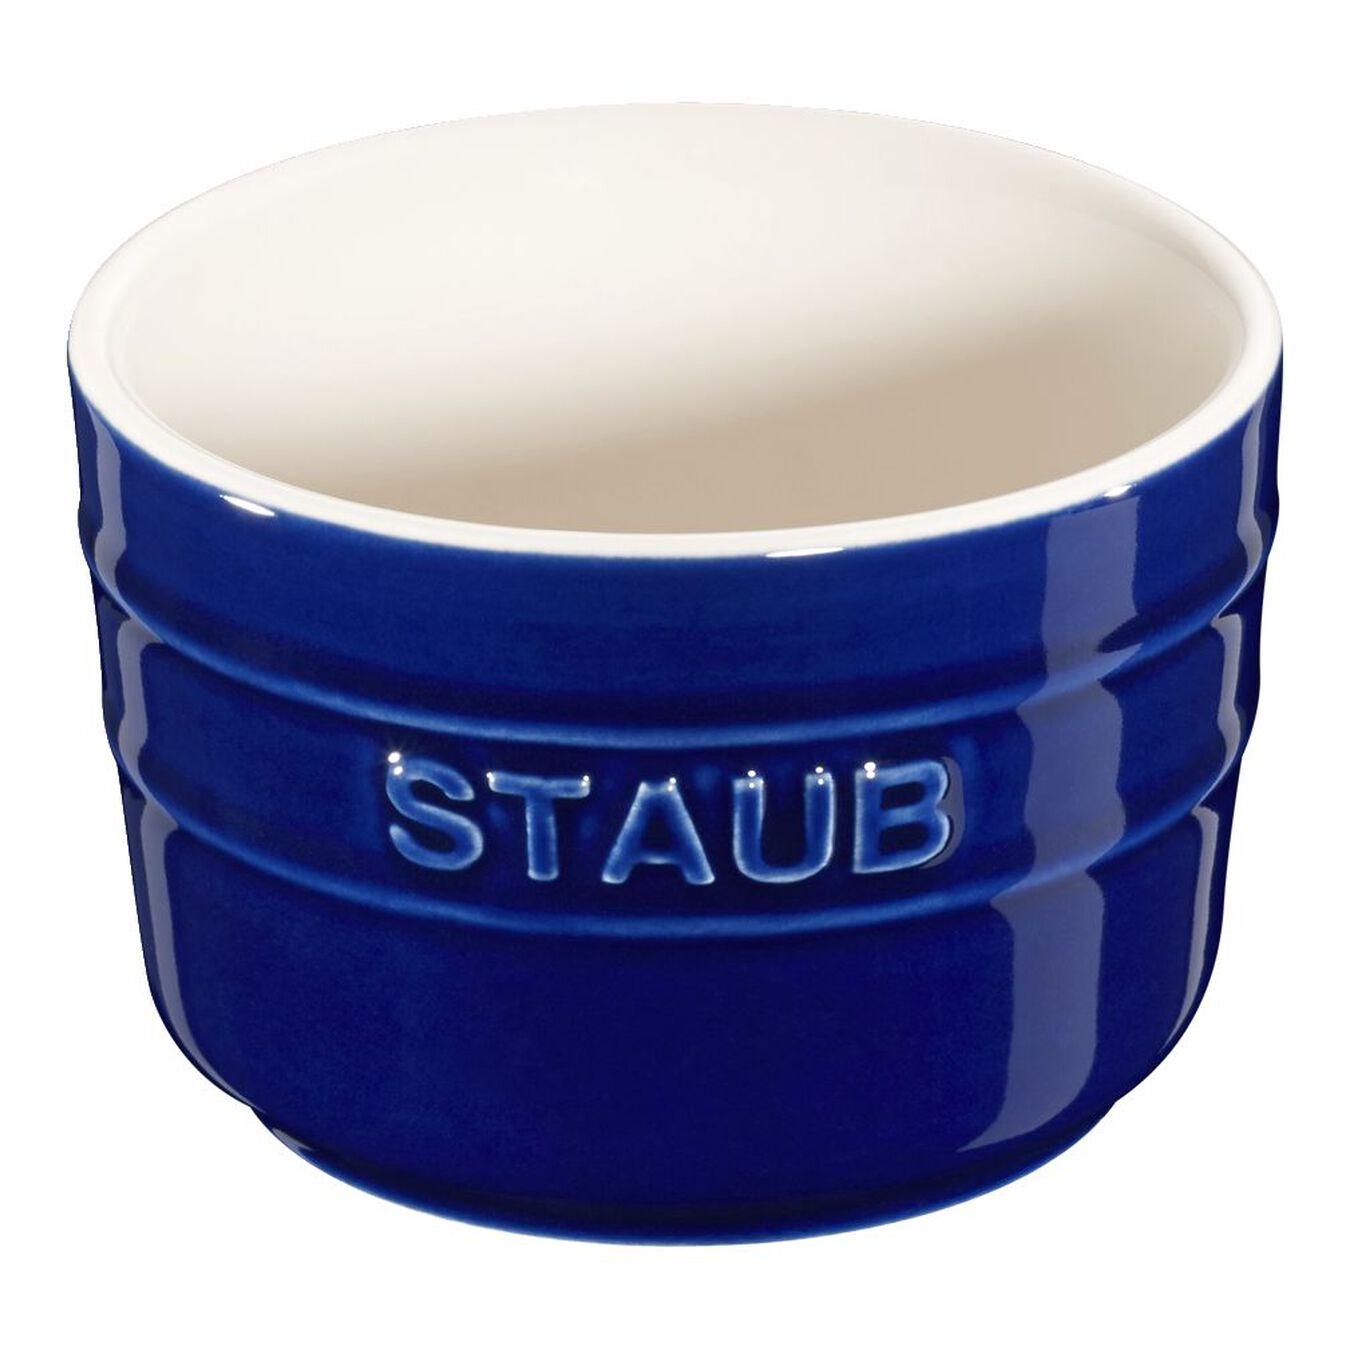 2-pc Round Ramekin Set - Dark Blue,,large 1